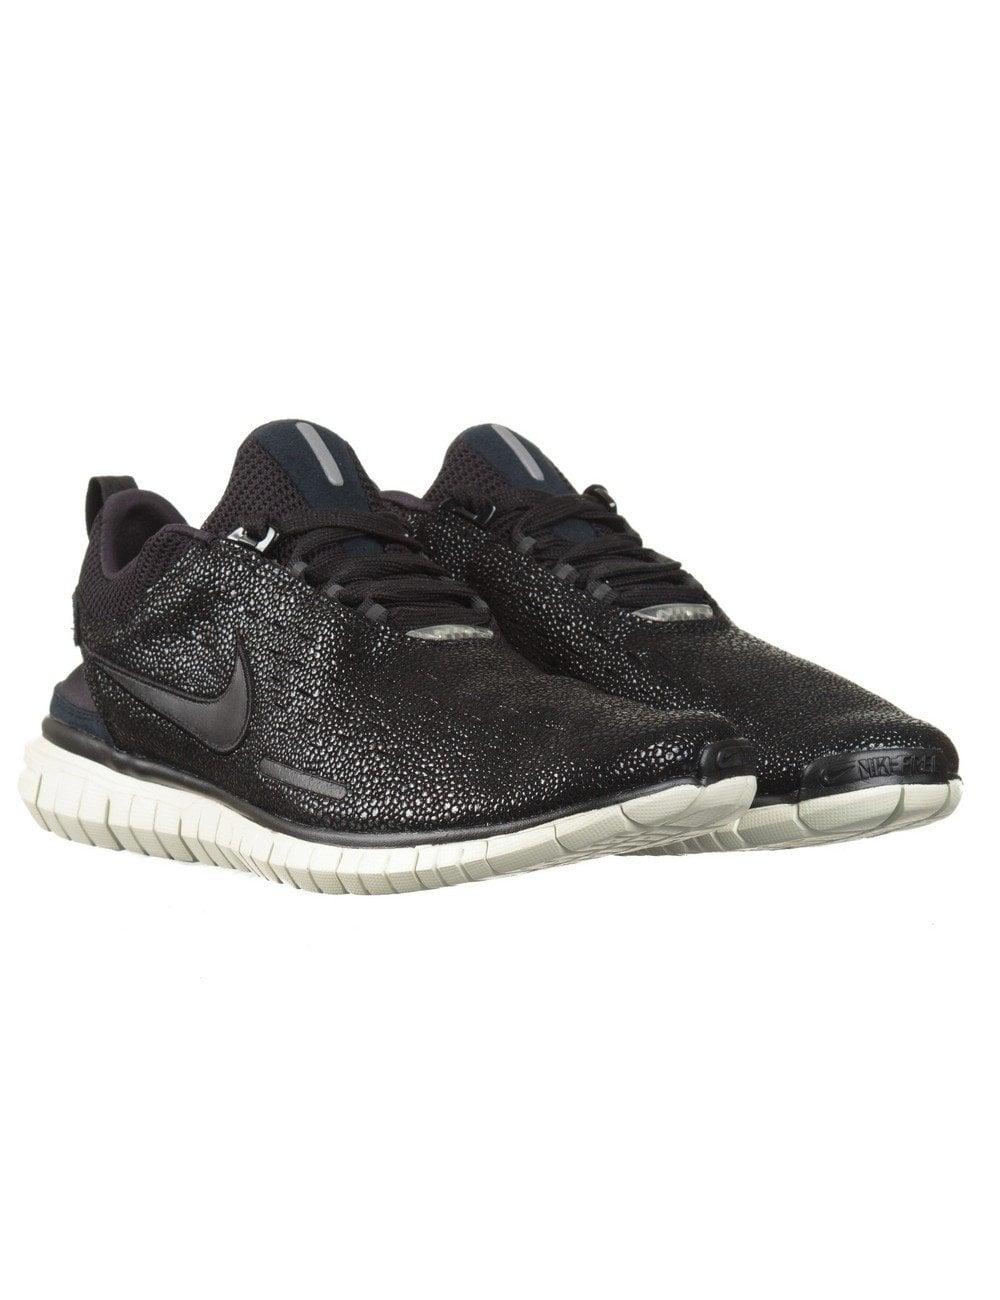 ab5da13b4db5 Nike Free OG 14 PA Shoes - Black Seaglass (Stingray Pack) - Footwear ...